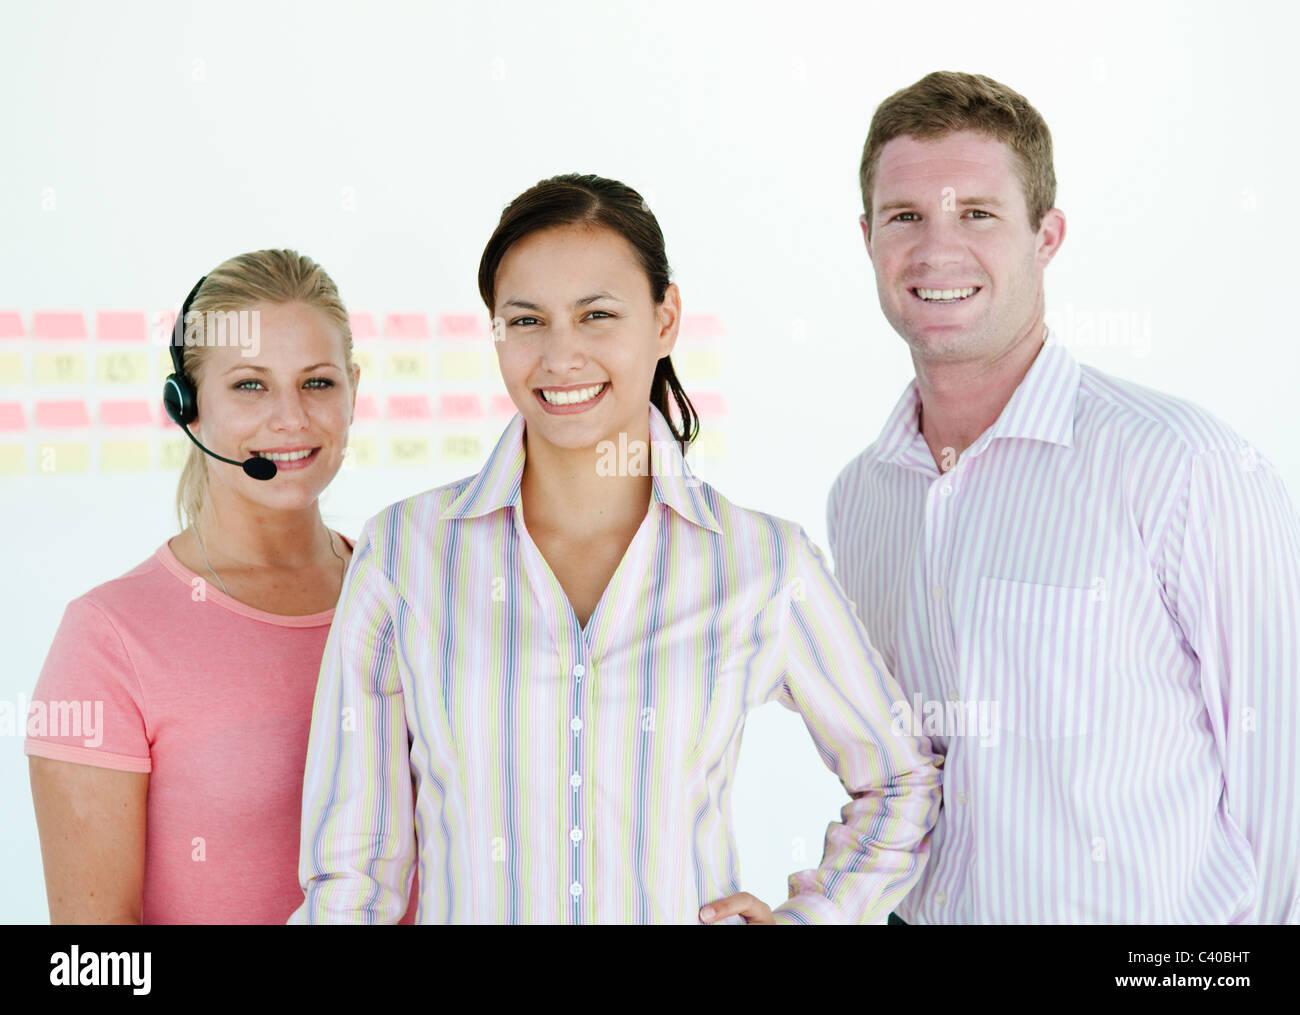 Confident sales team - Stock Image